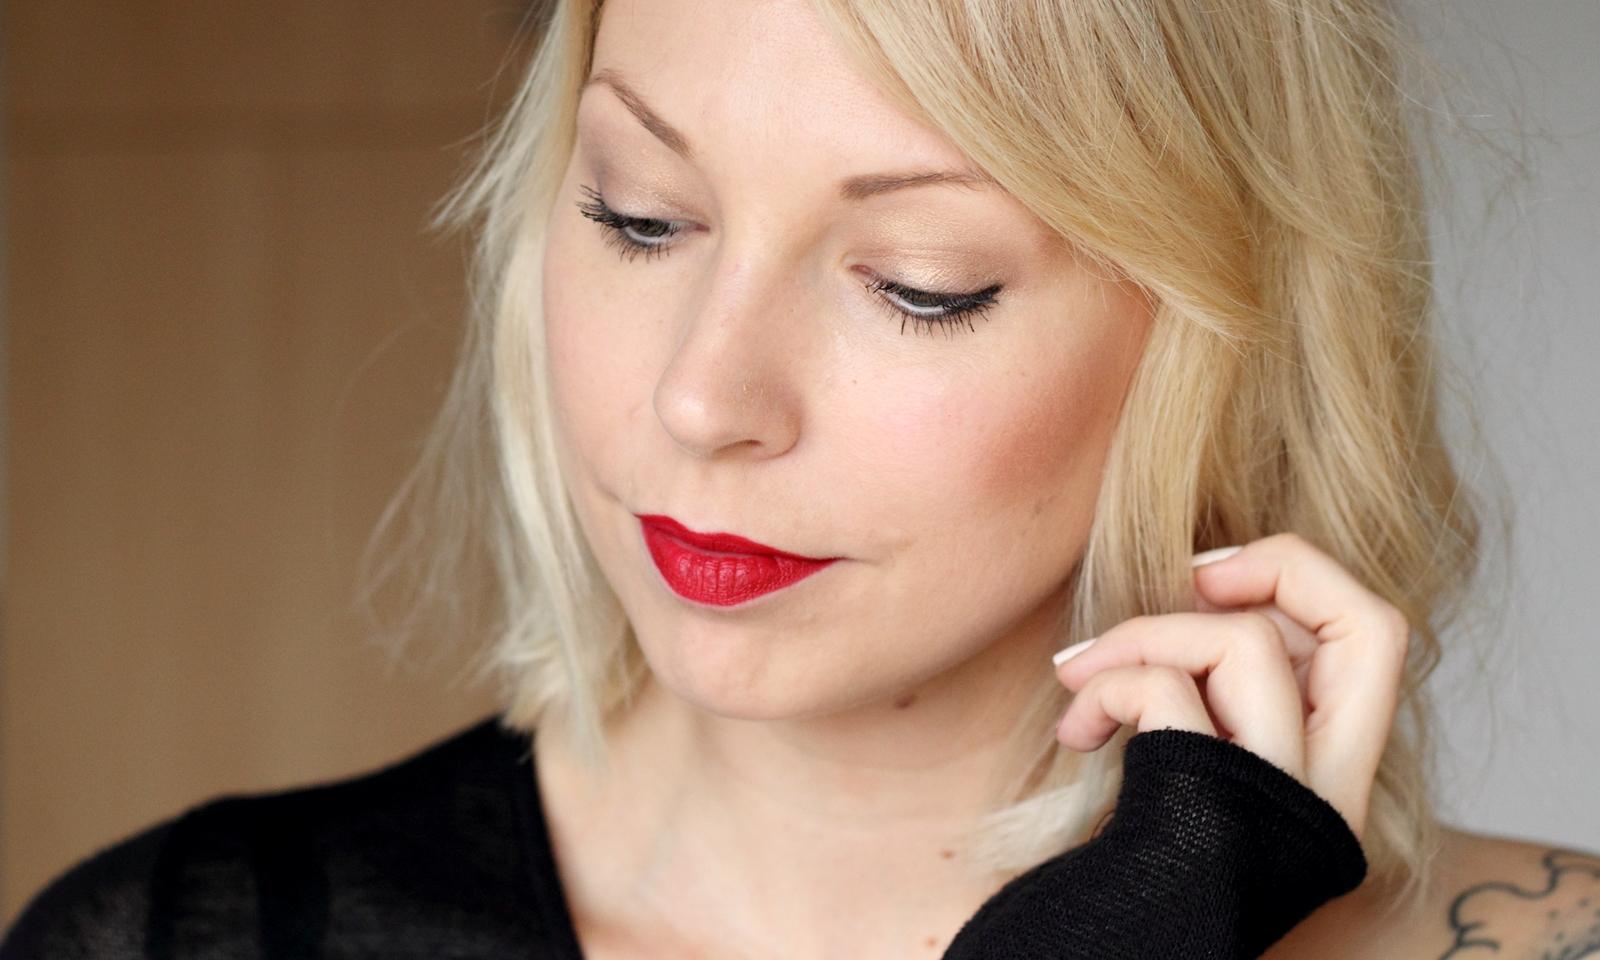 beautyblogger karlsruhe mac lippenstift lipstick russian red swatch 7 lavie deboite. Black Bedroom Furniture Sets. Home Design Ideas